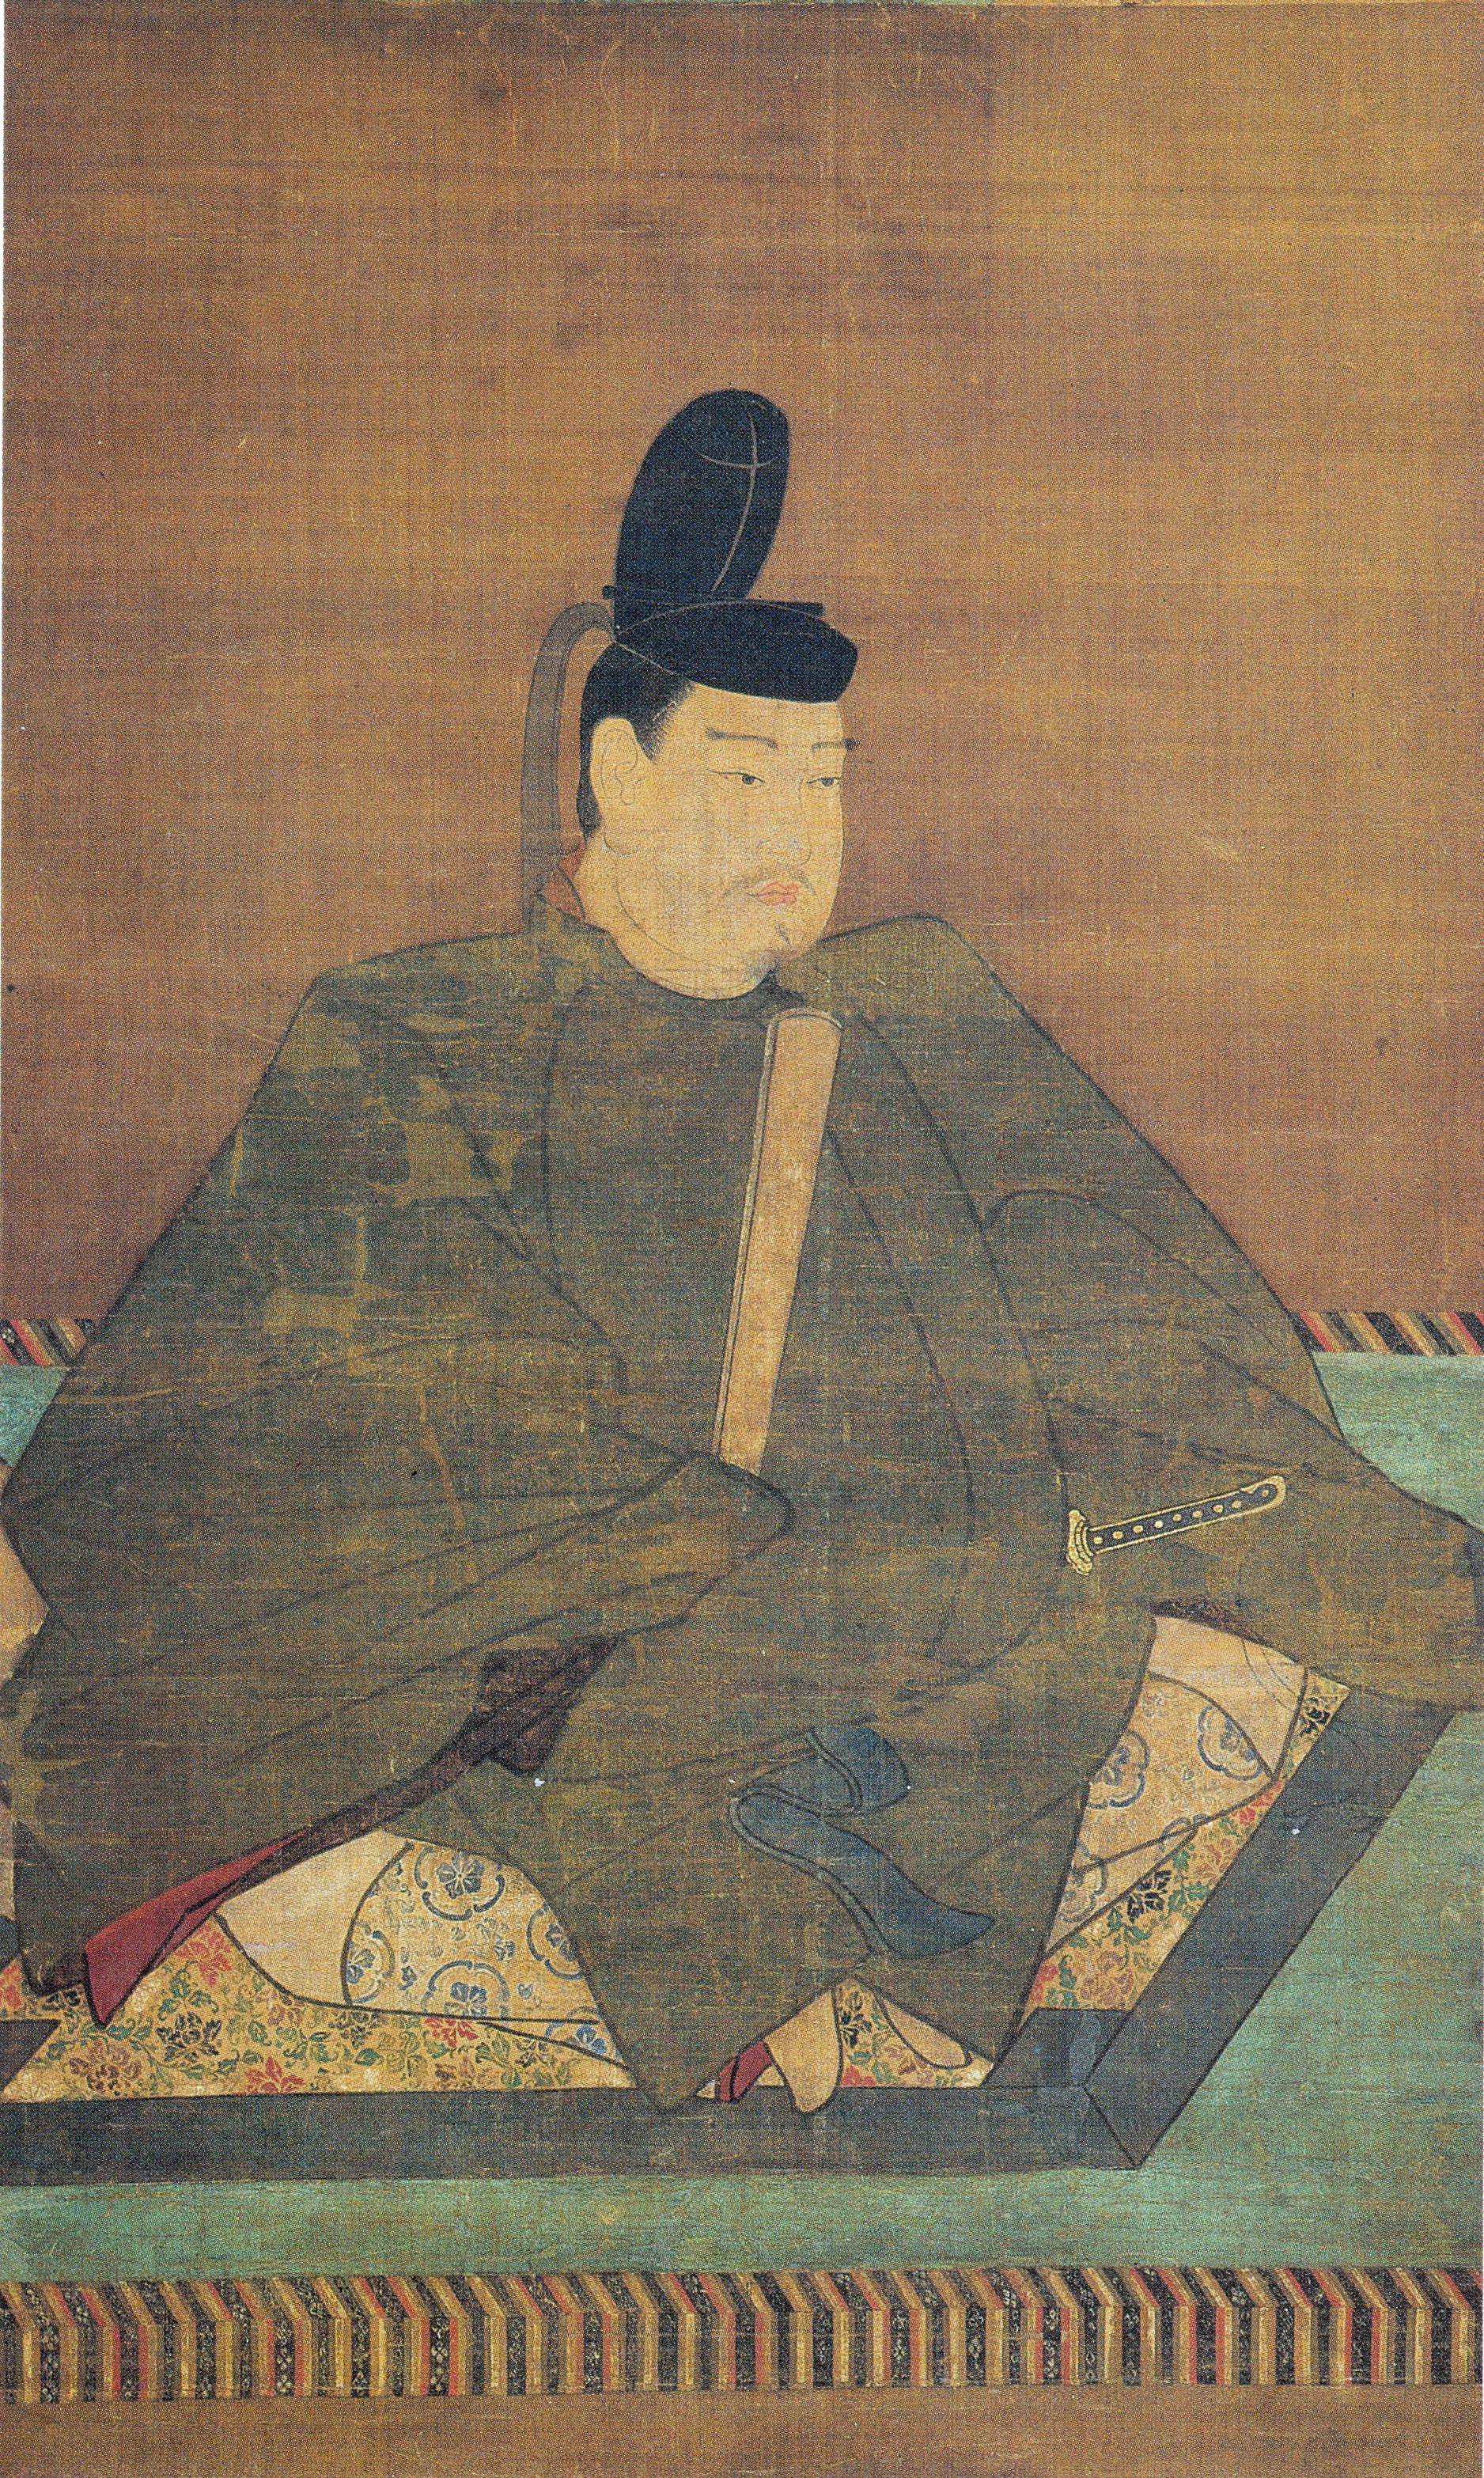 http://upload.wikimedia.org/wikipedia/commons/3/3f/Emperor_Shomu.jpg